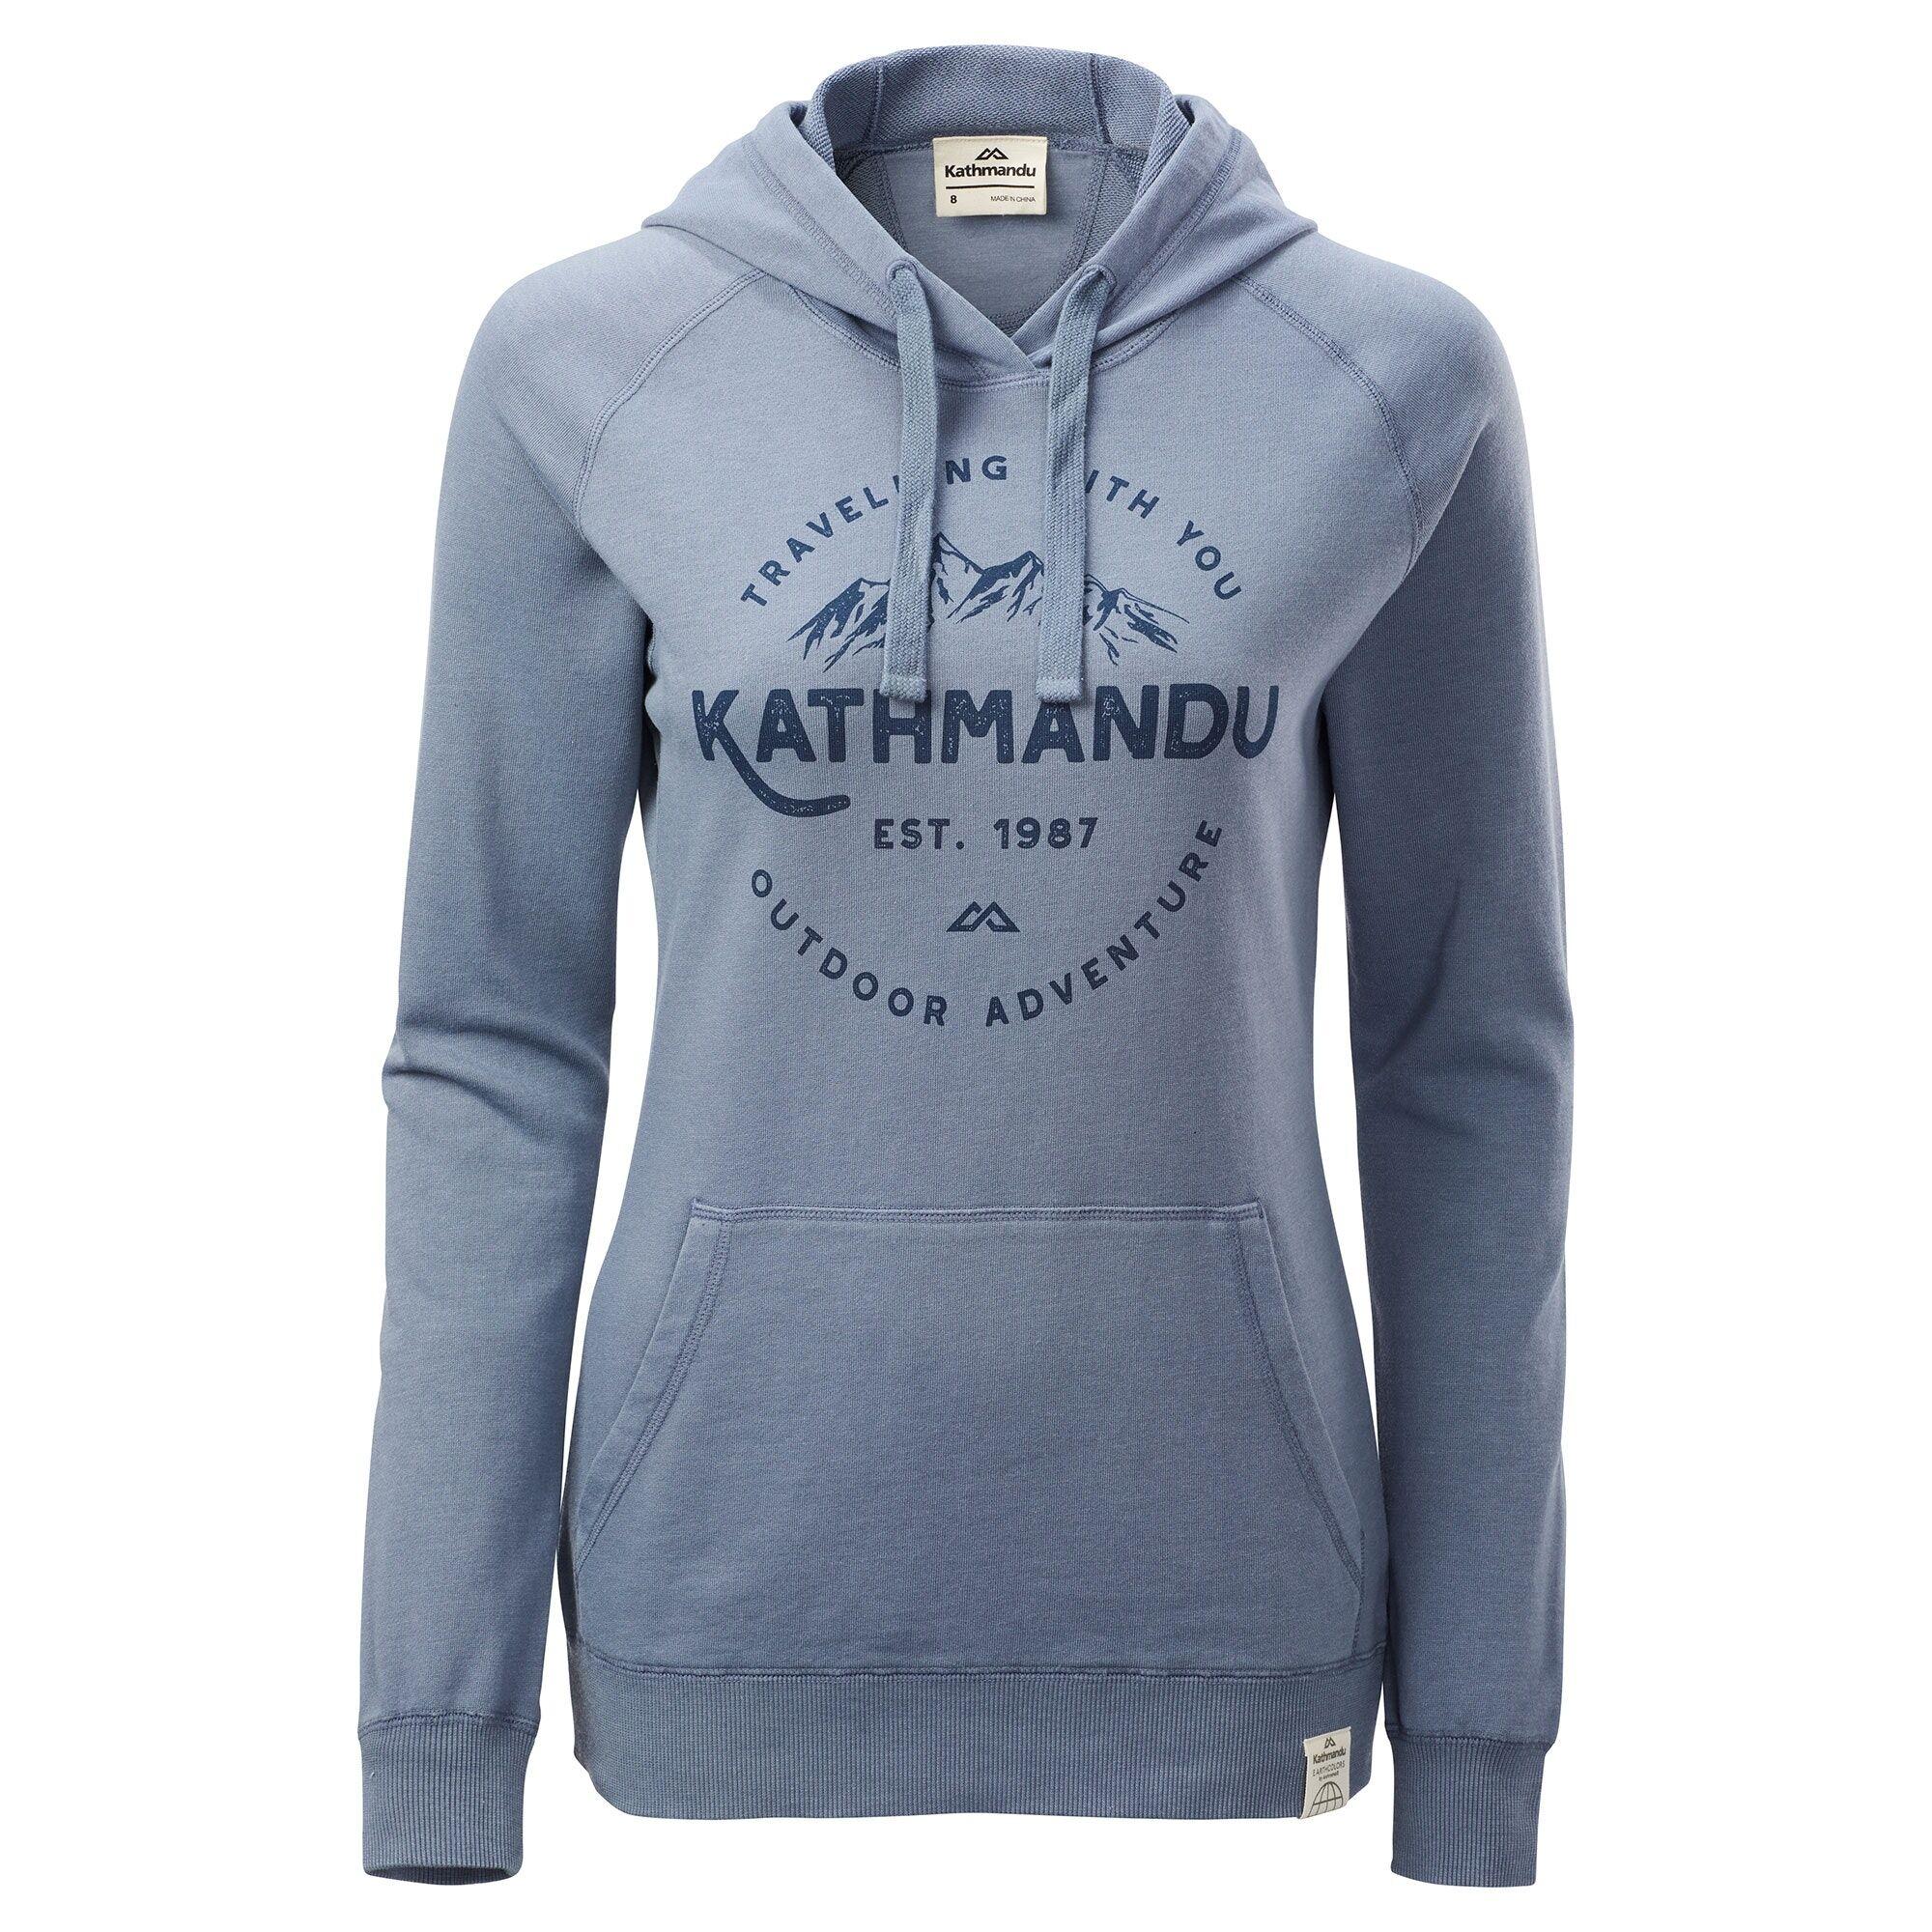 Kathmandu Earthcolours Women's Hooded Pullover  - Forever Blue/Outdoor Adventure Print - Size: US 10